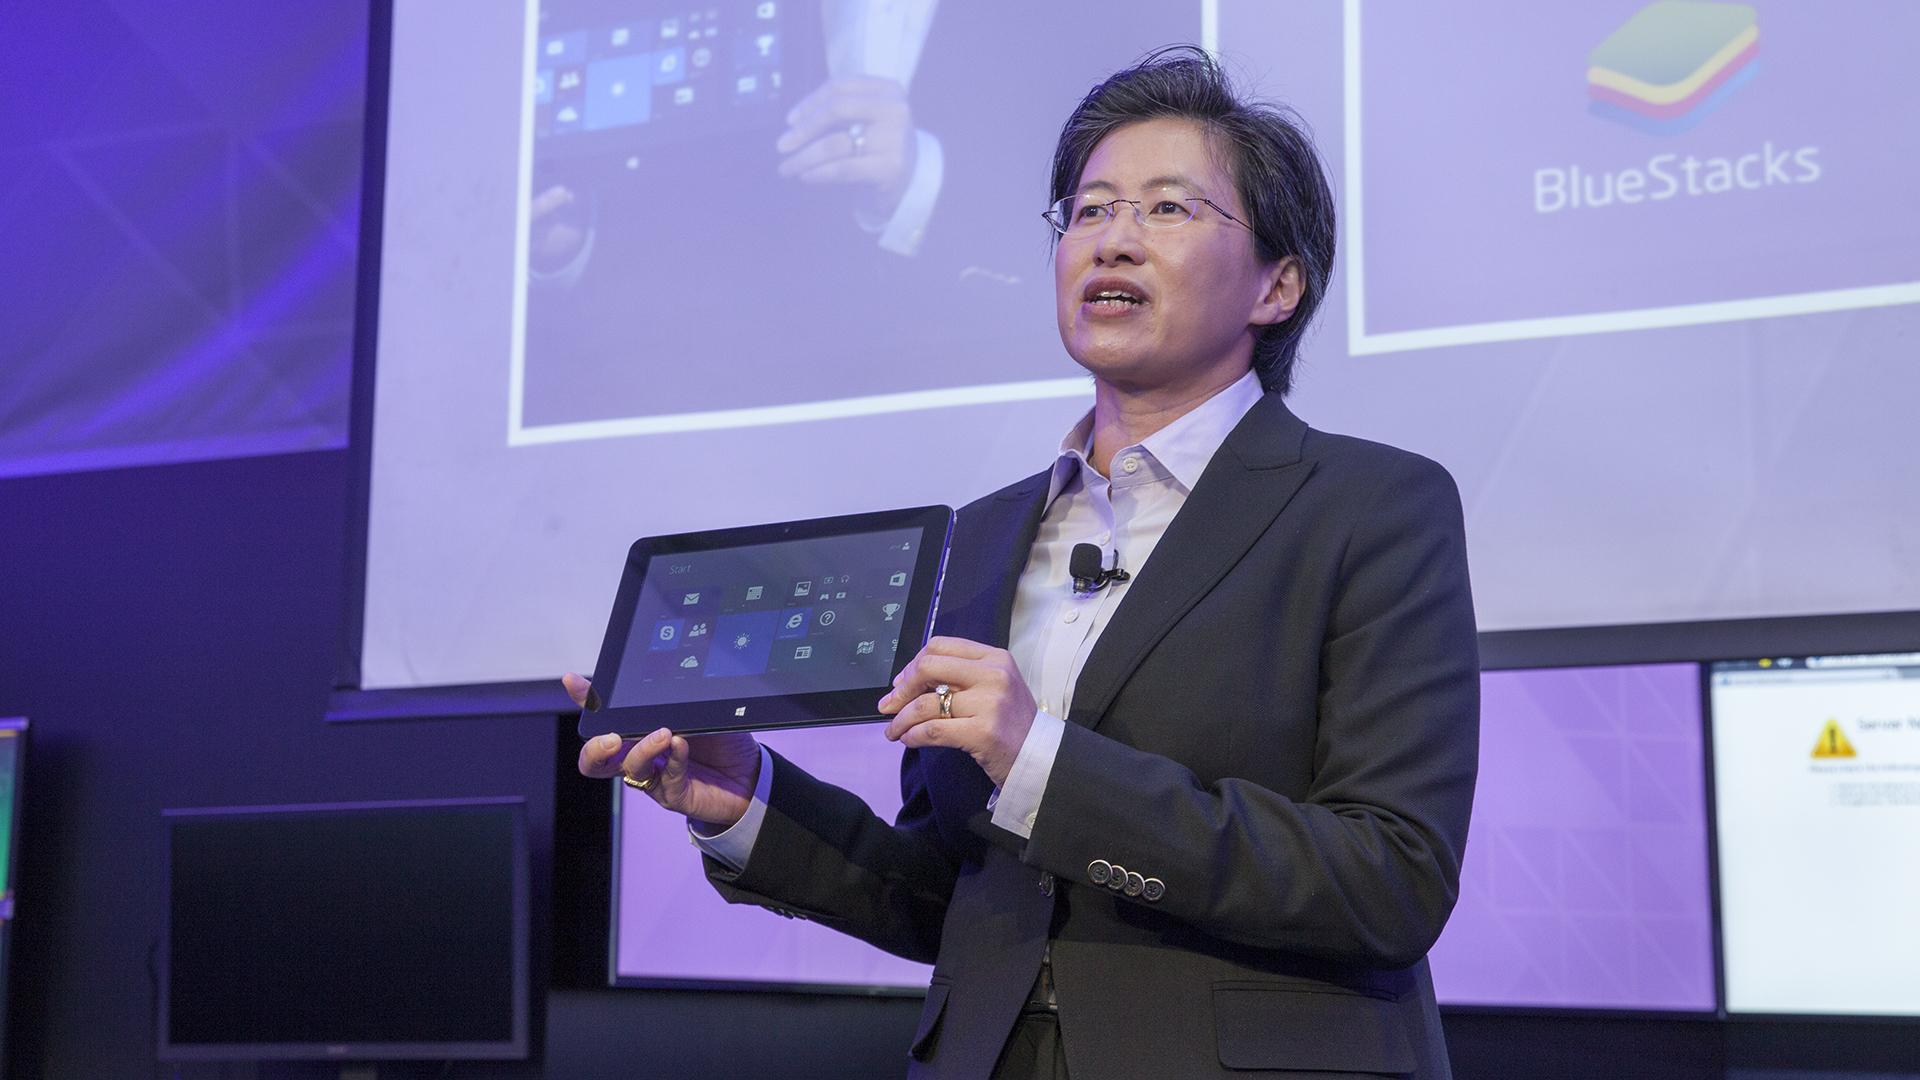 AMD於2014年國際消費電子展 展出極具革命性的視覺與音效饗宴